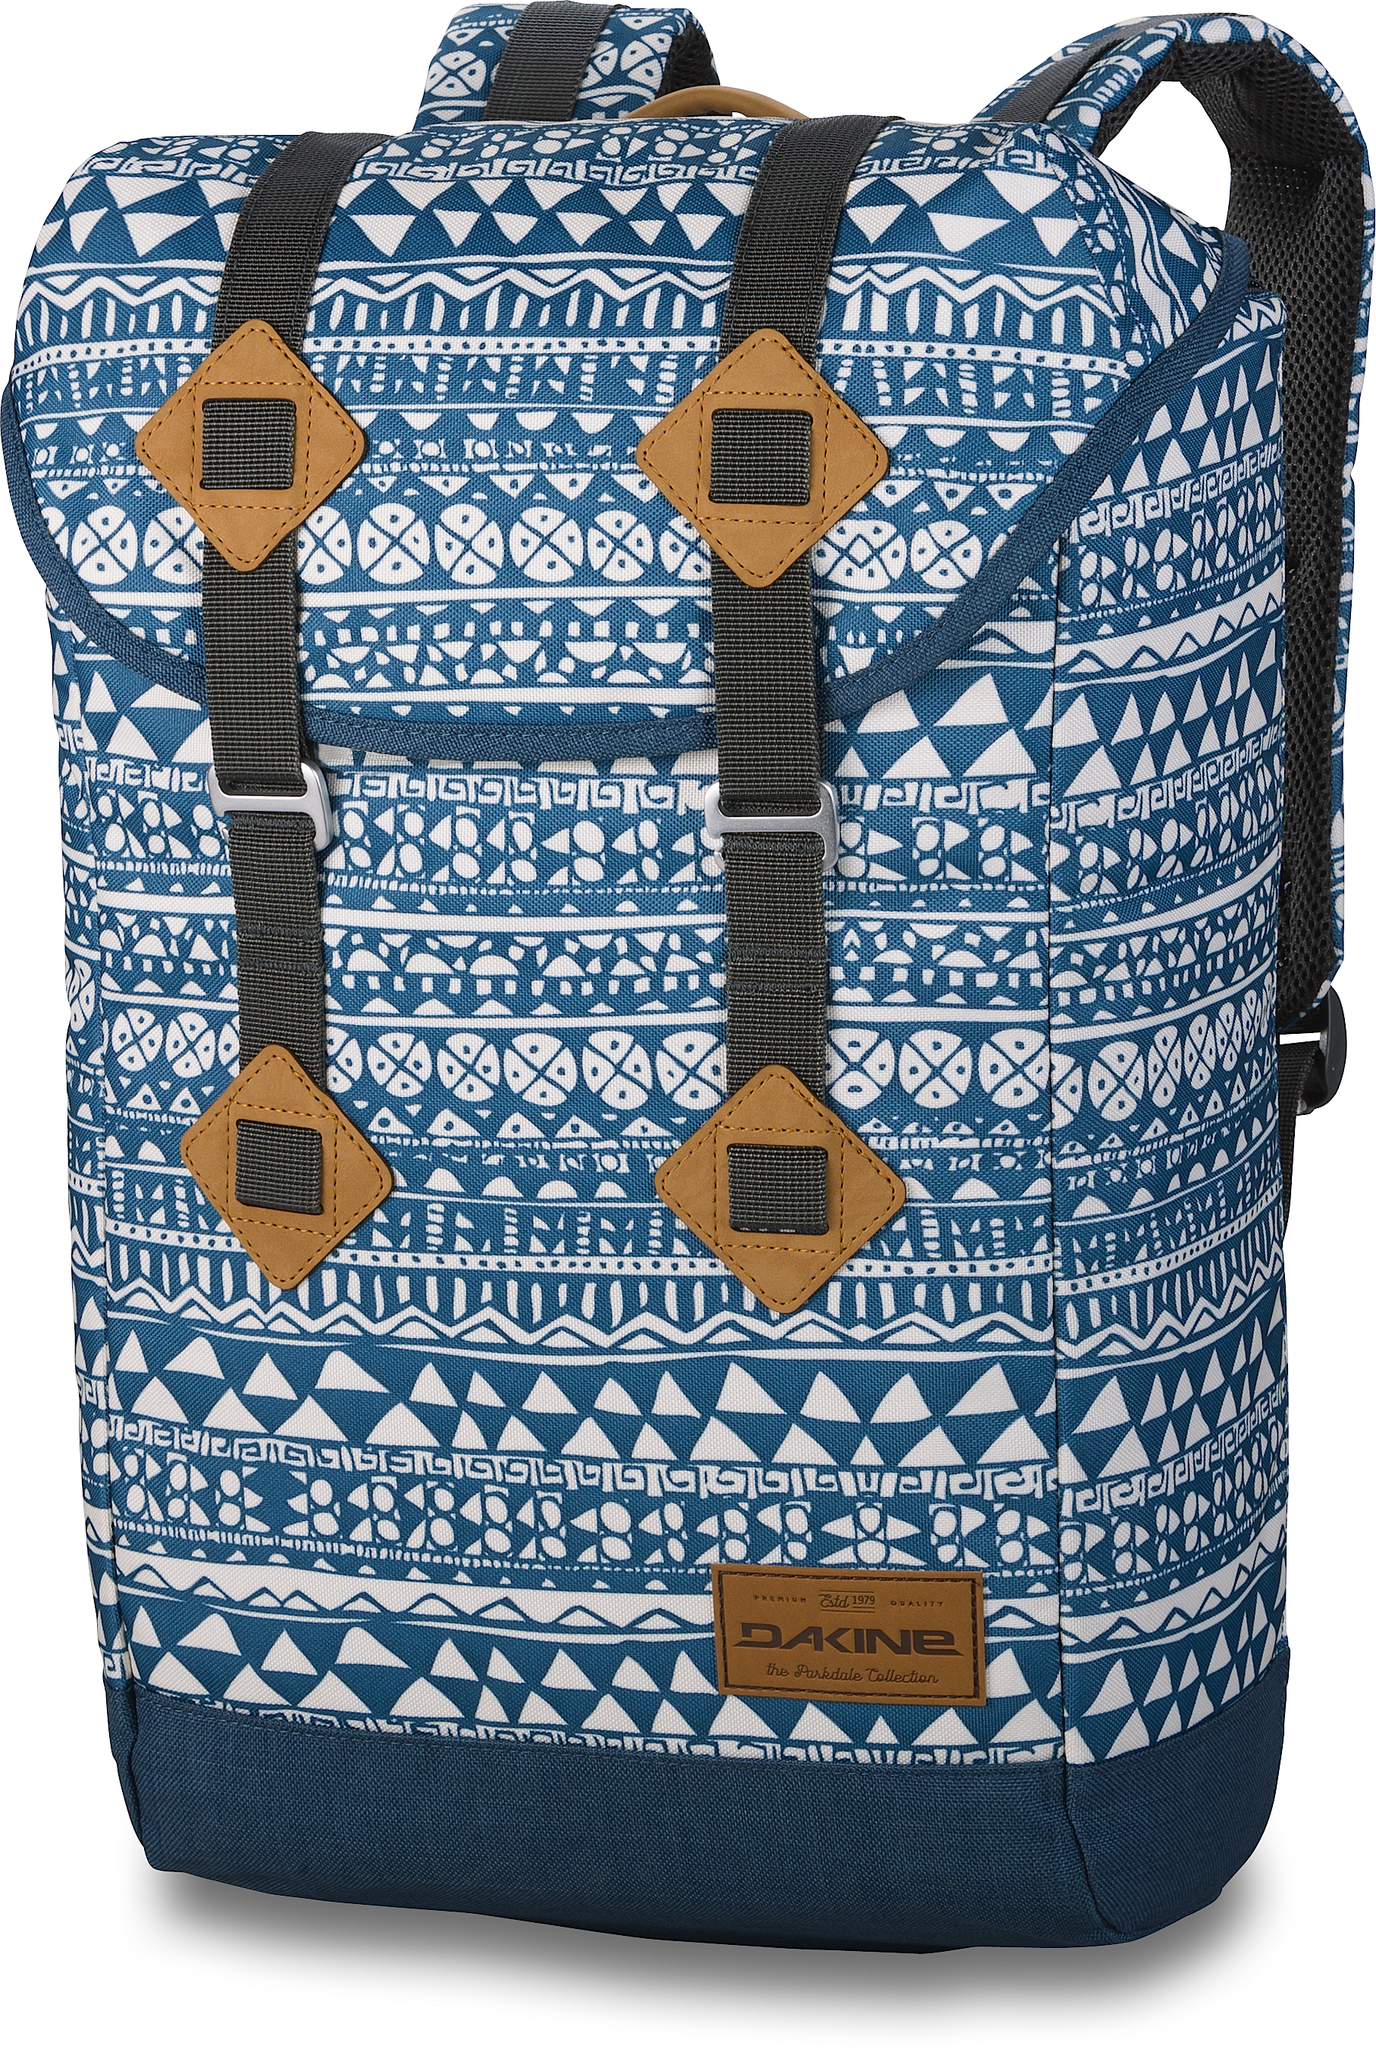 Рюкзаки до 15 дюймов Рюкзак Dakine TREK 26L MAKO 2015S-08130083-Trek26L-Mako.jpg